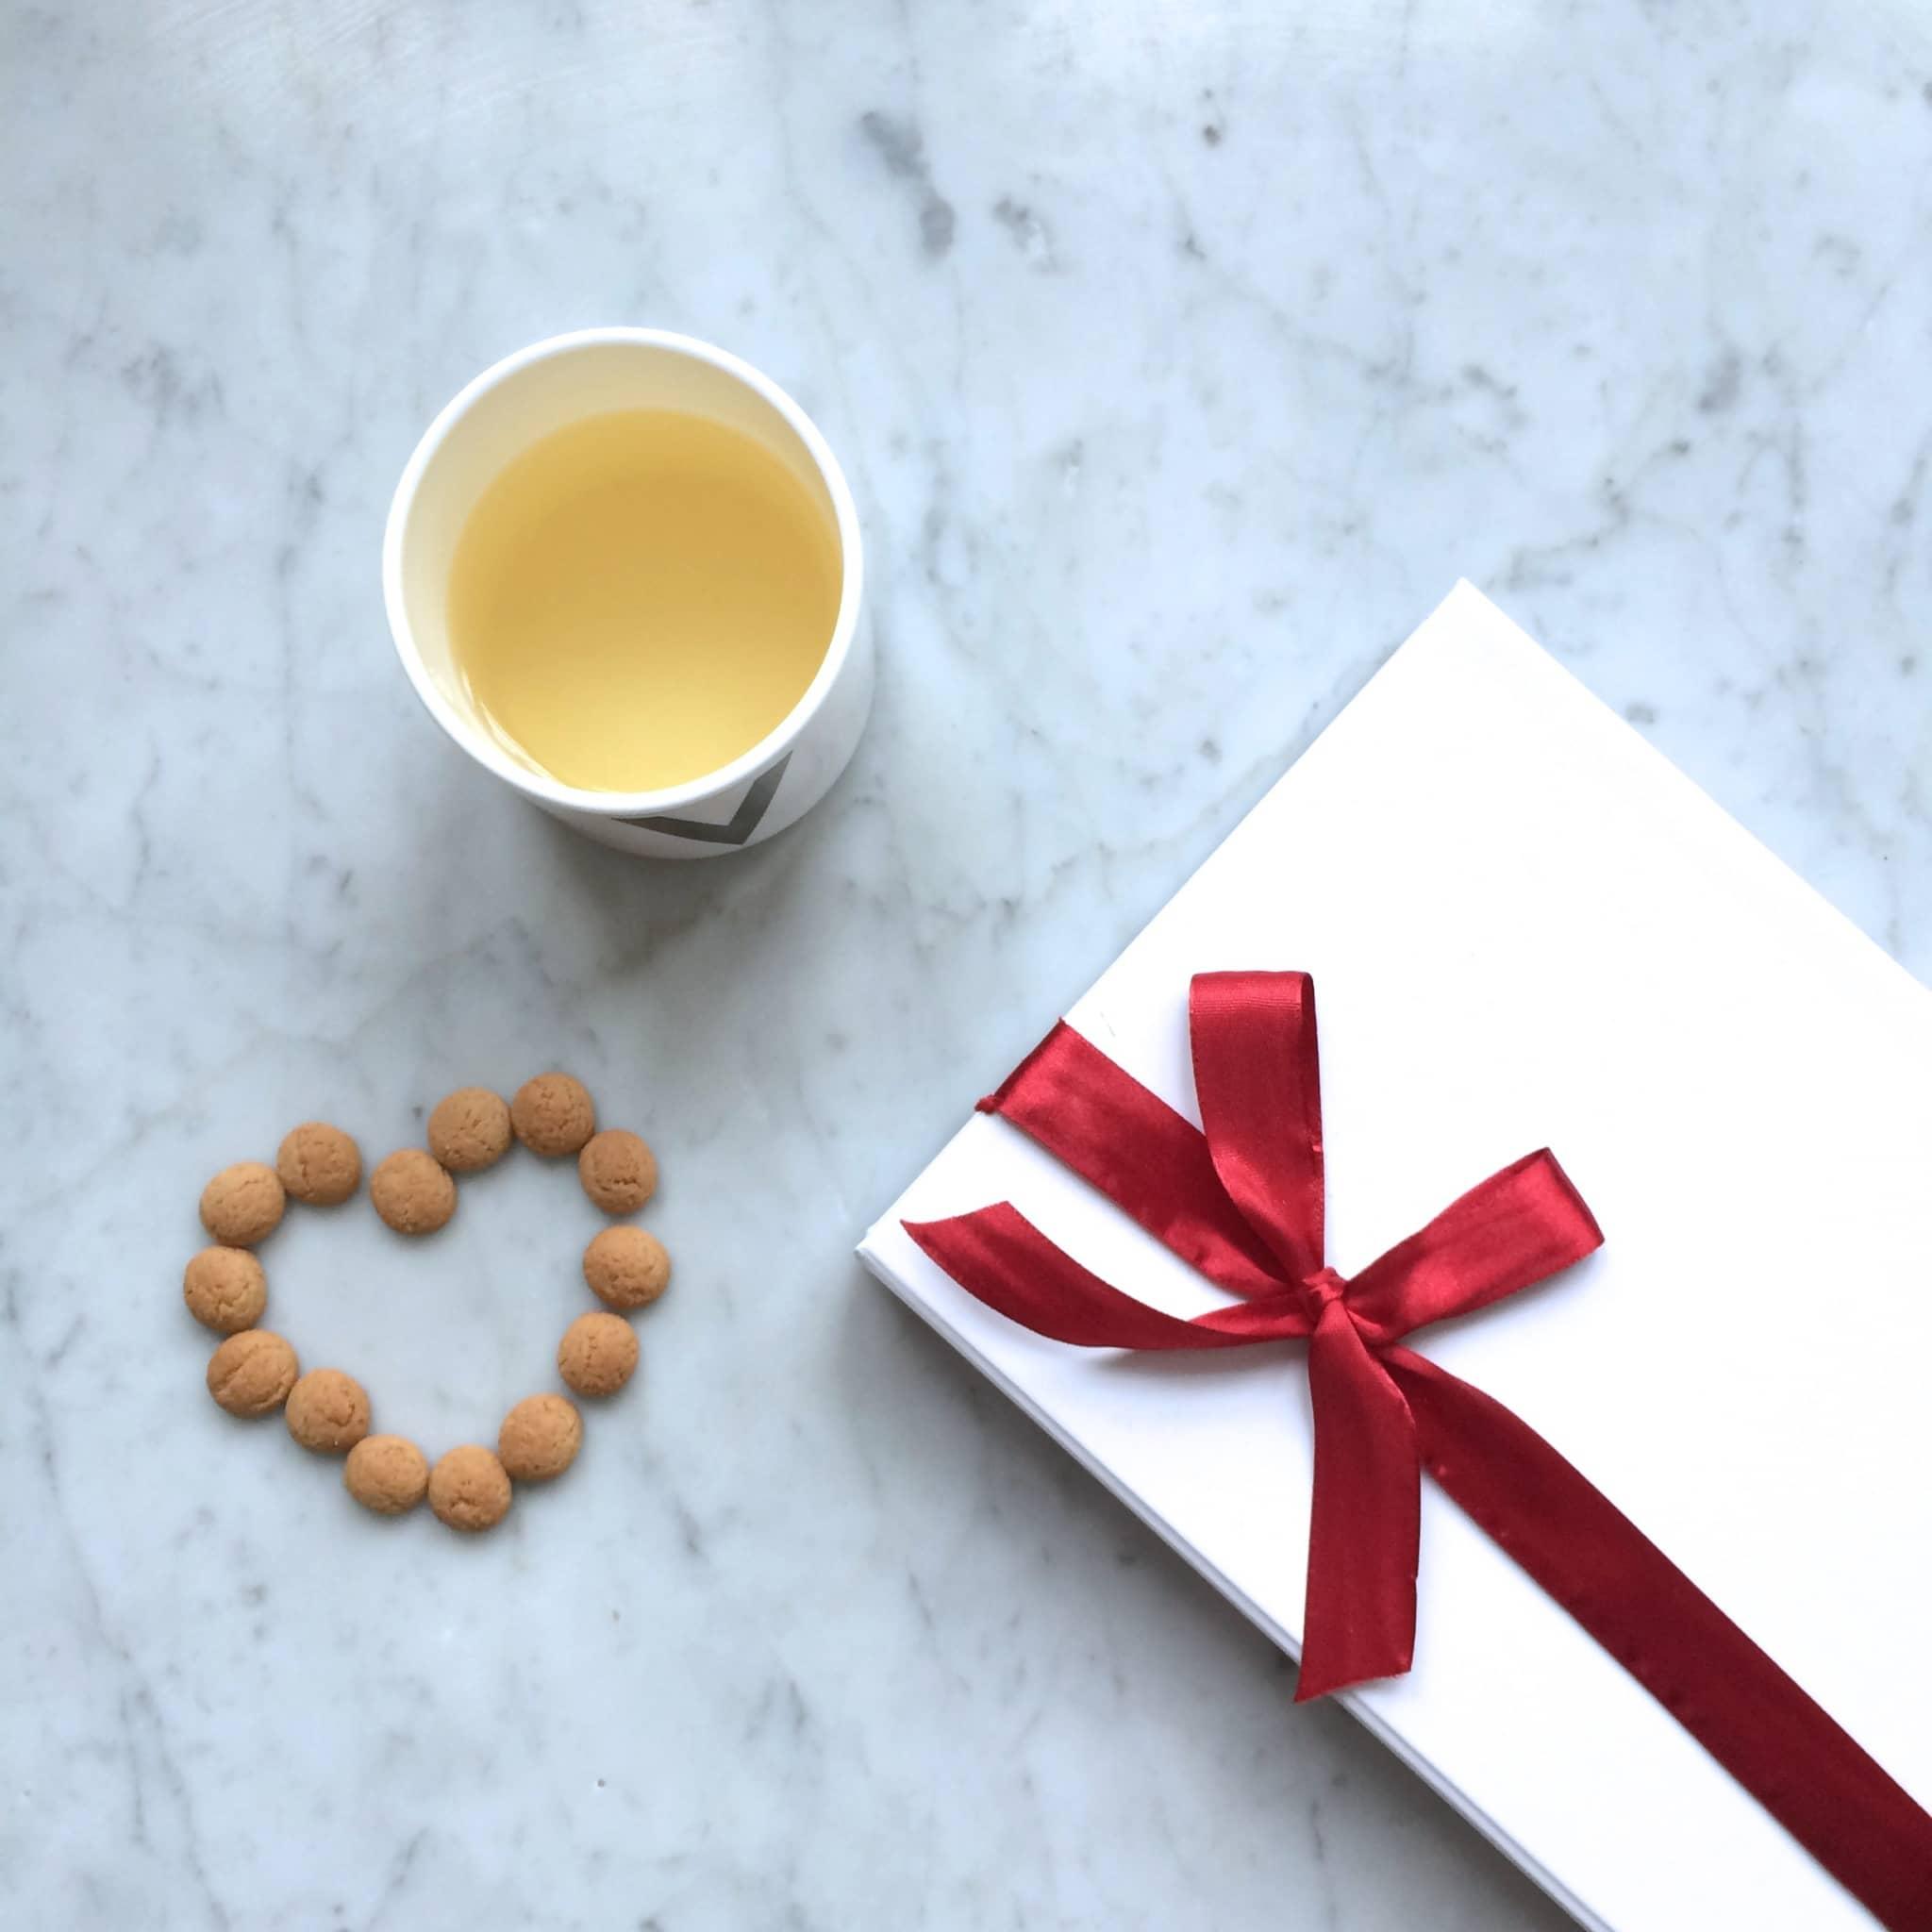 IMG 2321 - 15 Sinterklaas Kadotips voor foodies